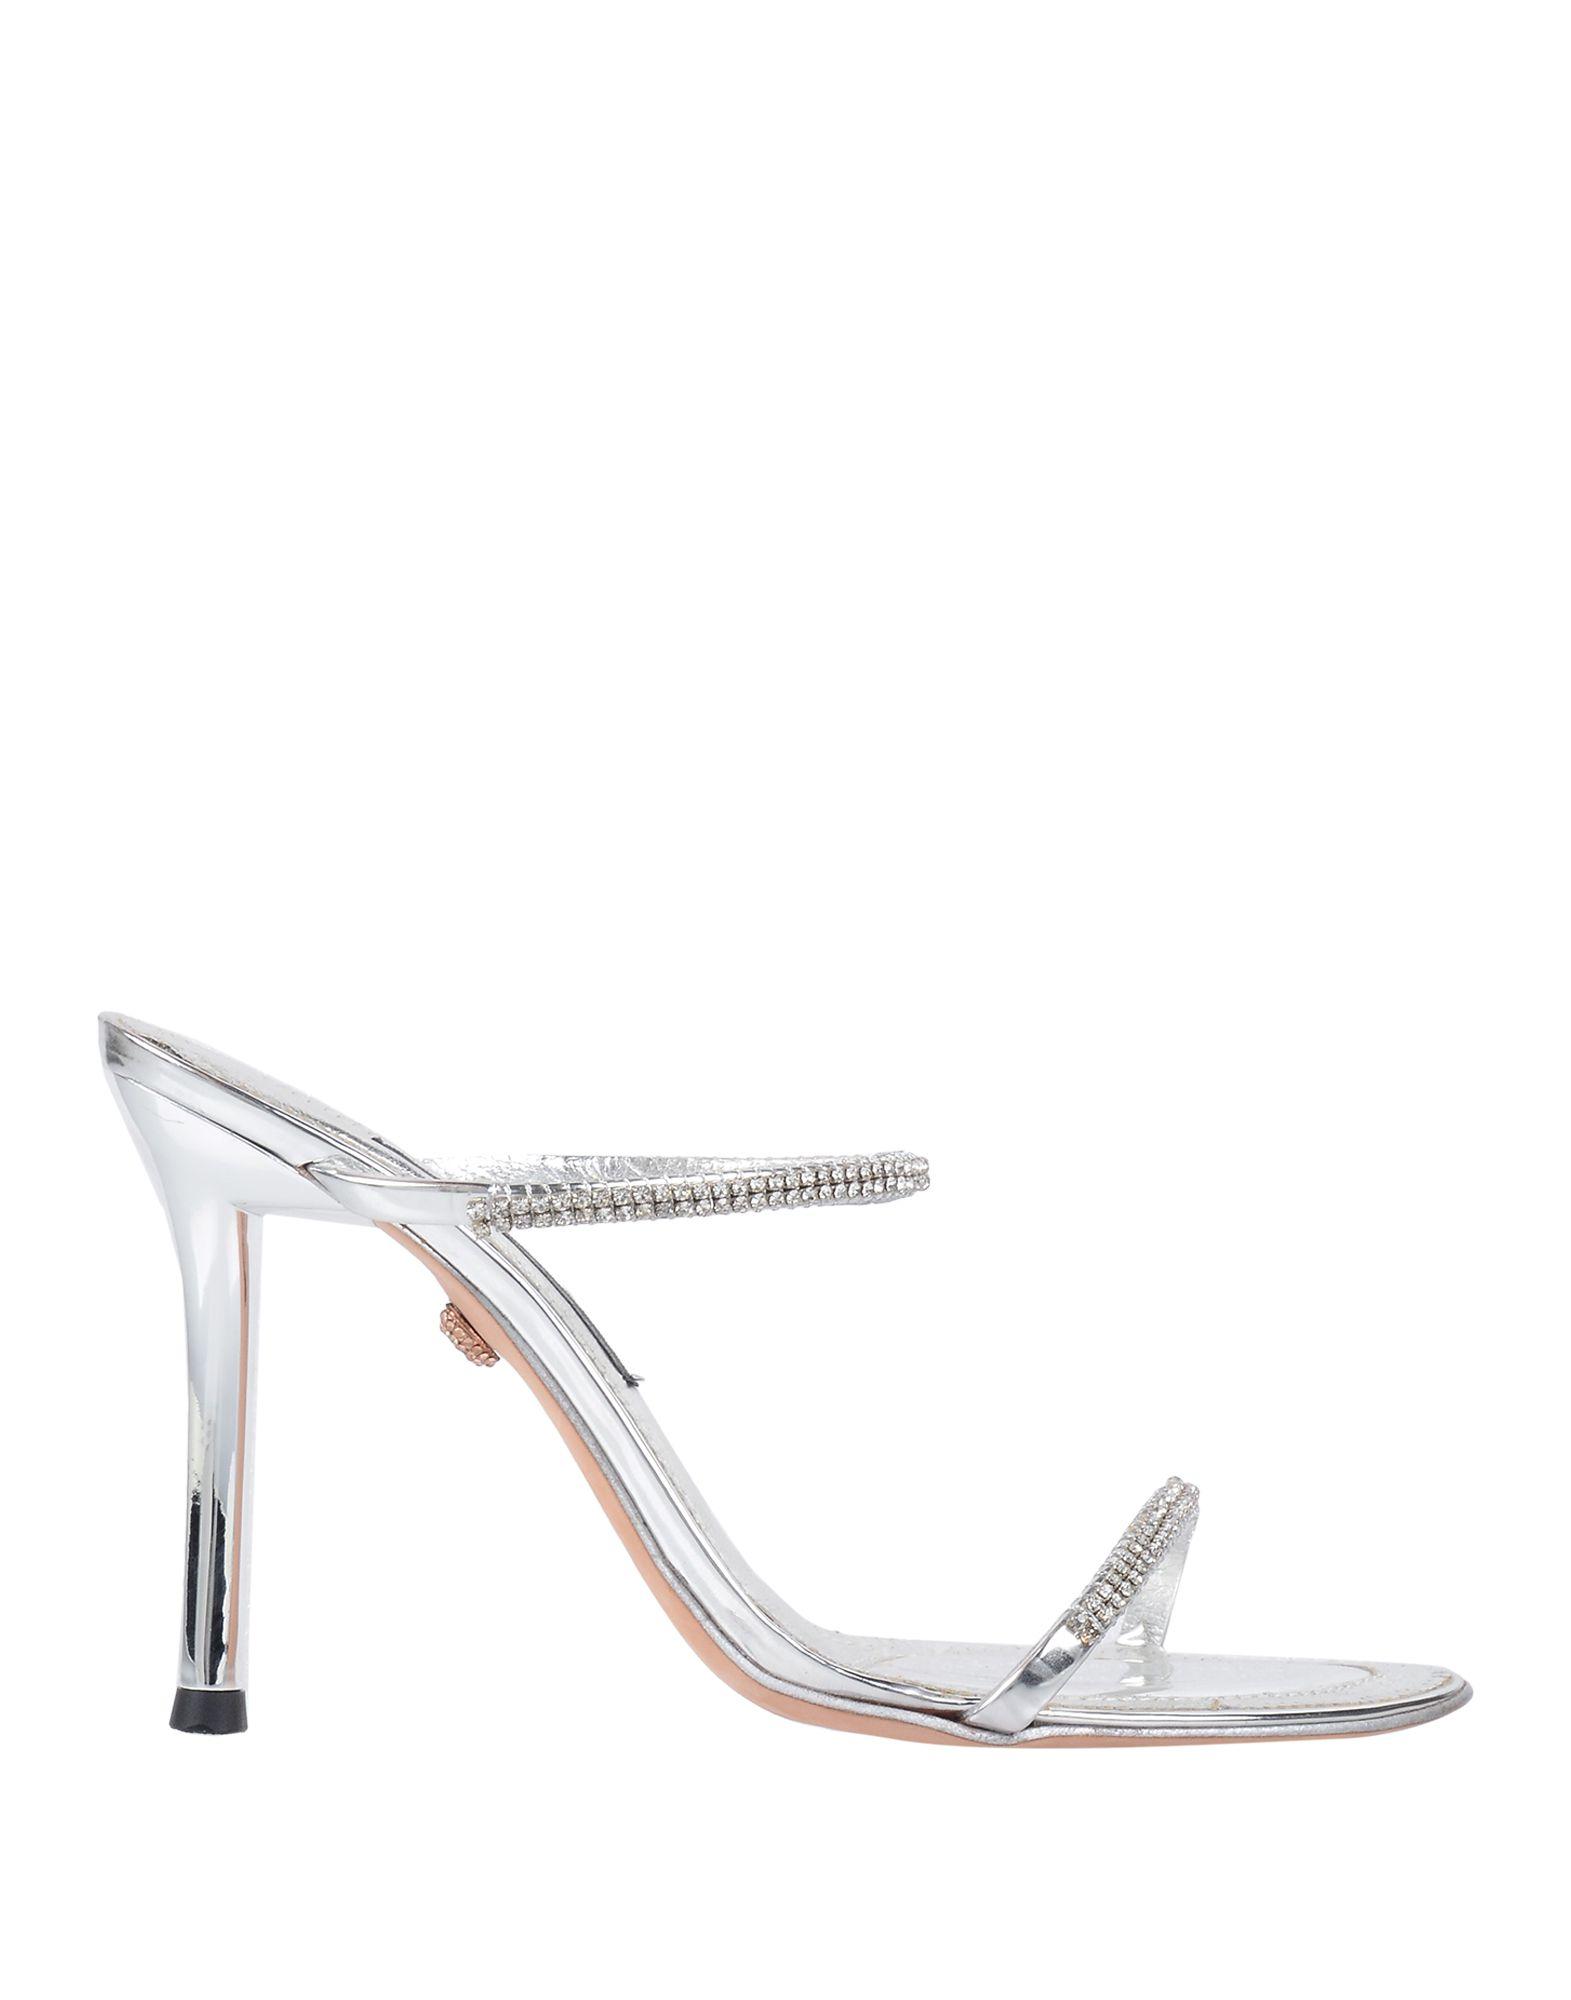 Stilvolle billige Schuhe  Alberto Venturini Sandalen Damen  Schuhe 11525471CK 457d02